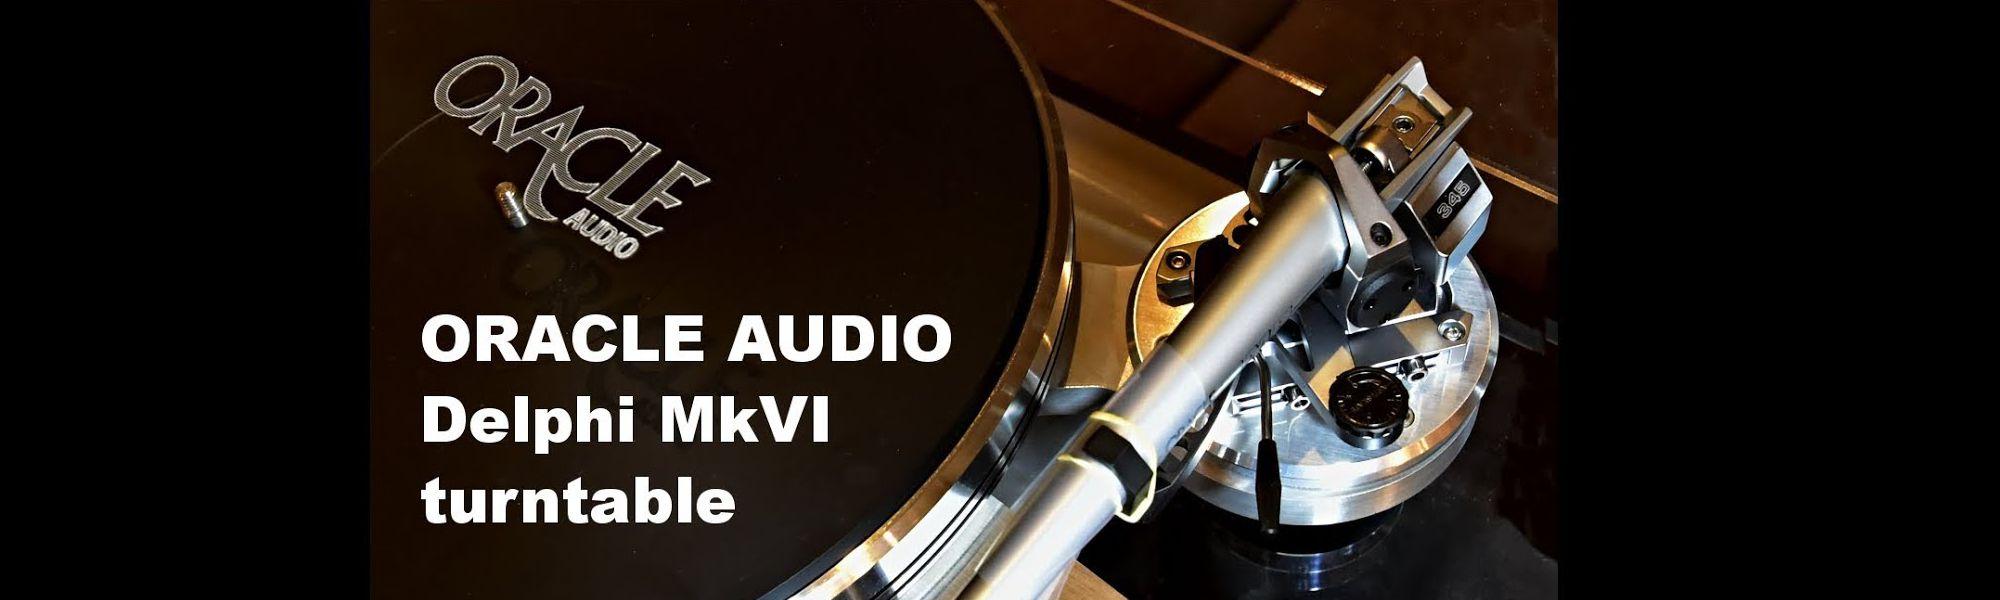 Oracle Audio Plattenspieler Delphi MKVI